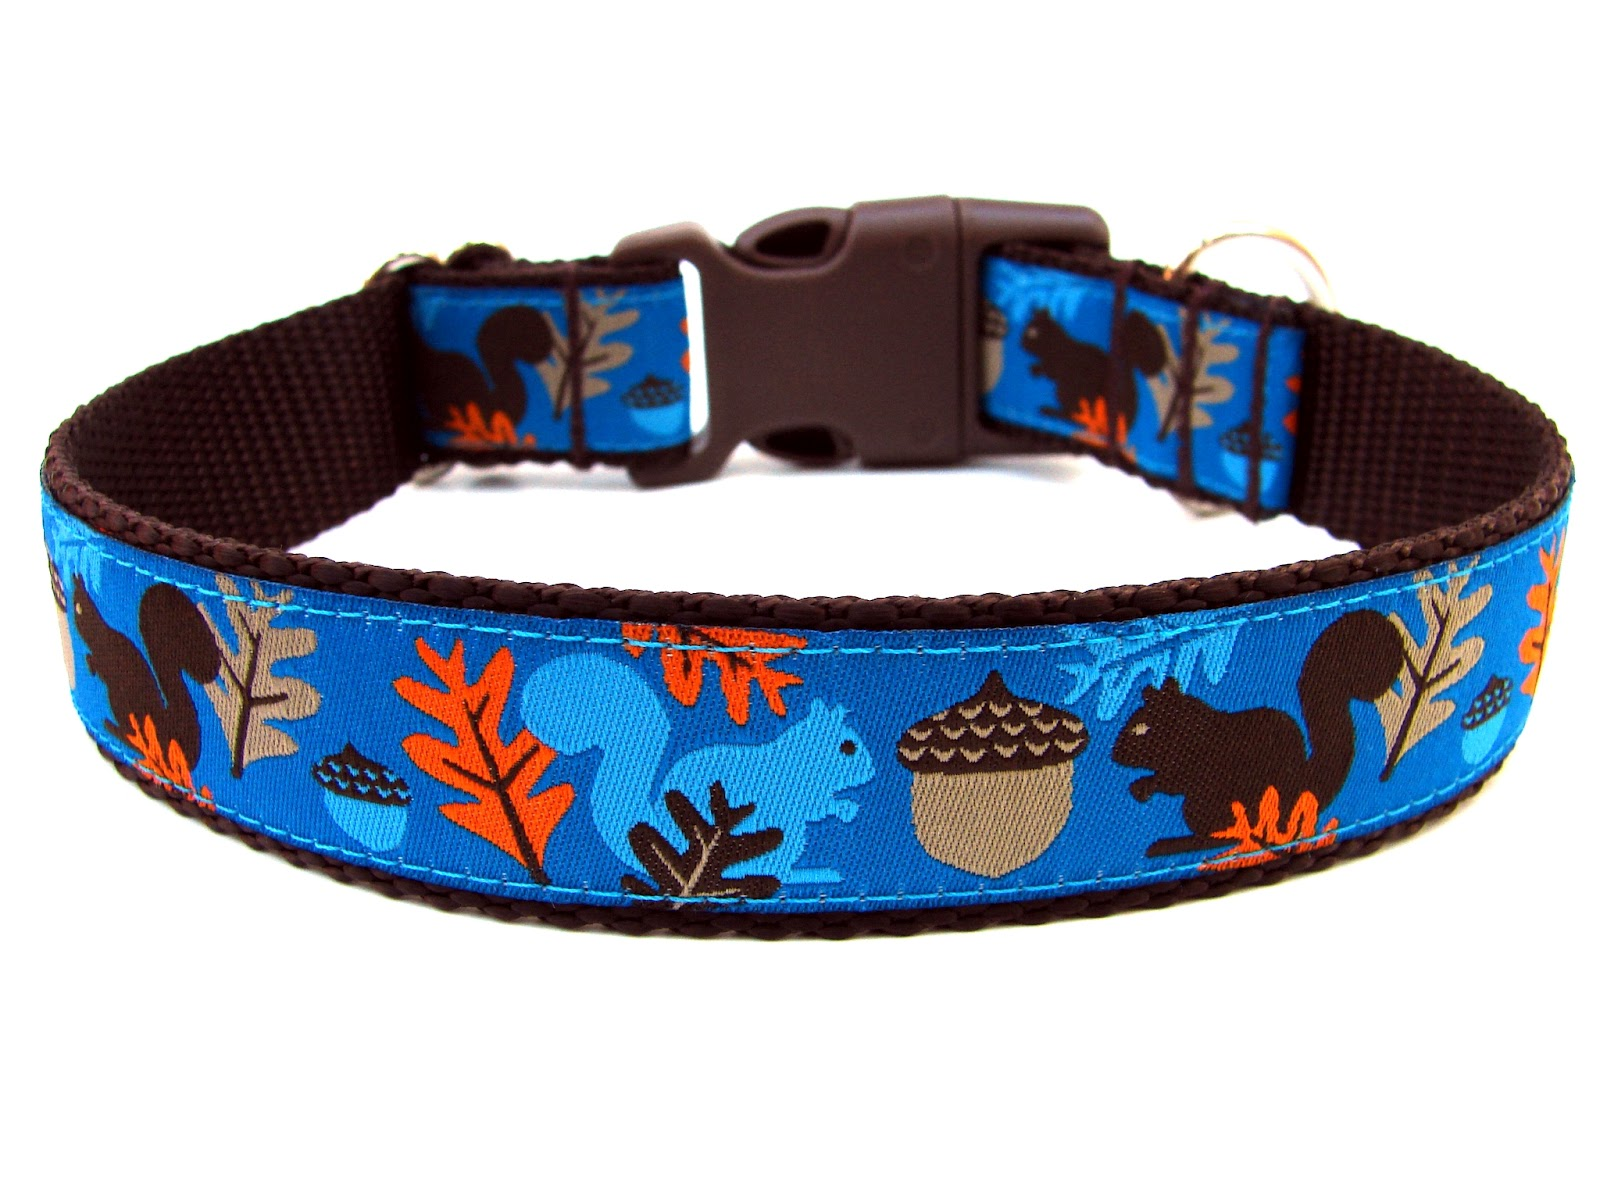 Designer Dog Collars   Wagologie   Fashion For Paws  Fall